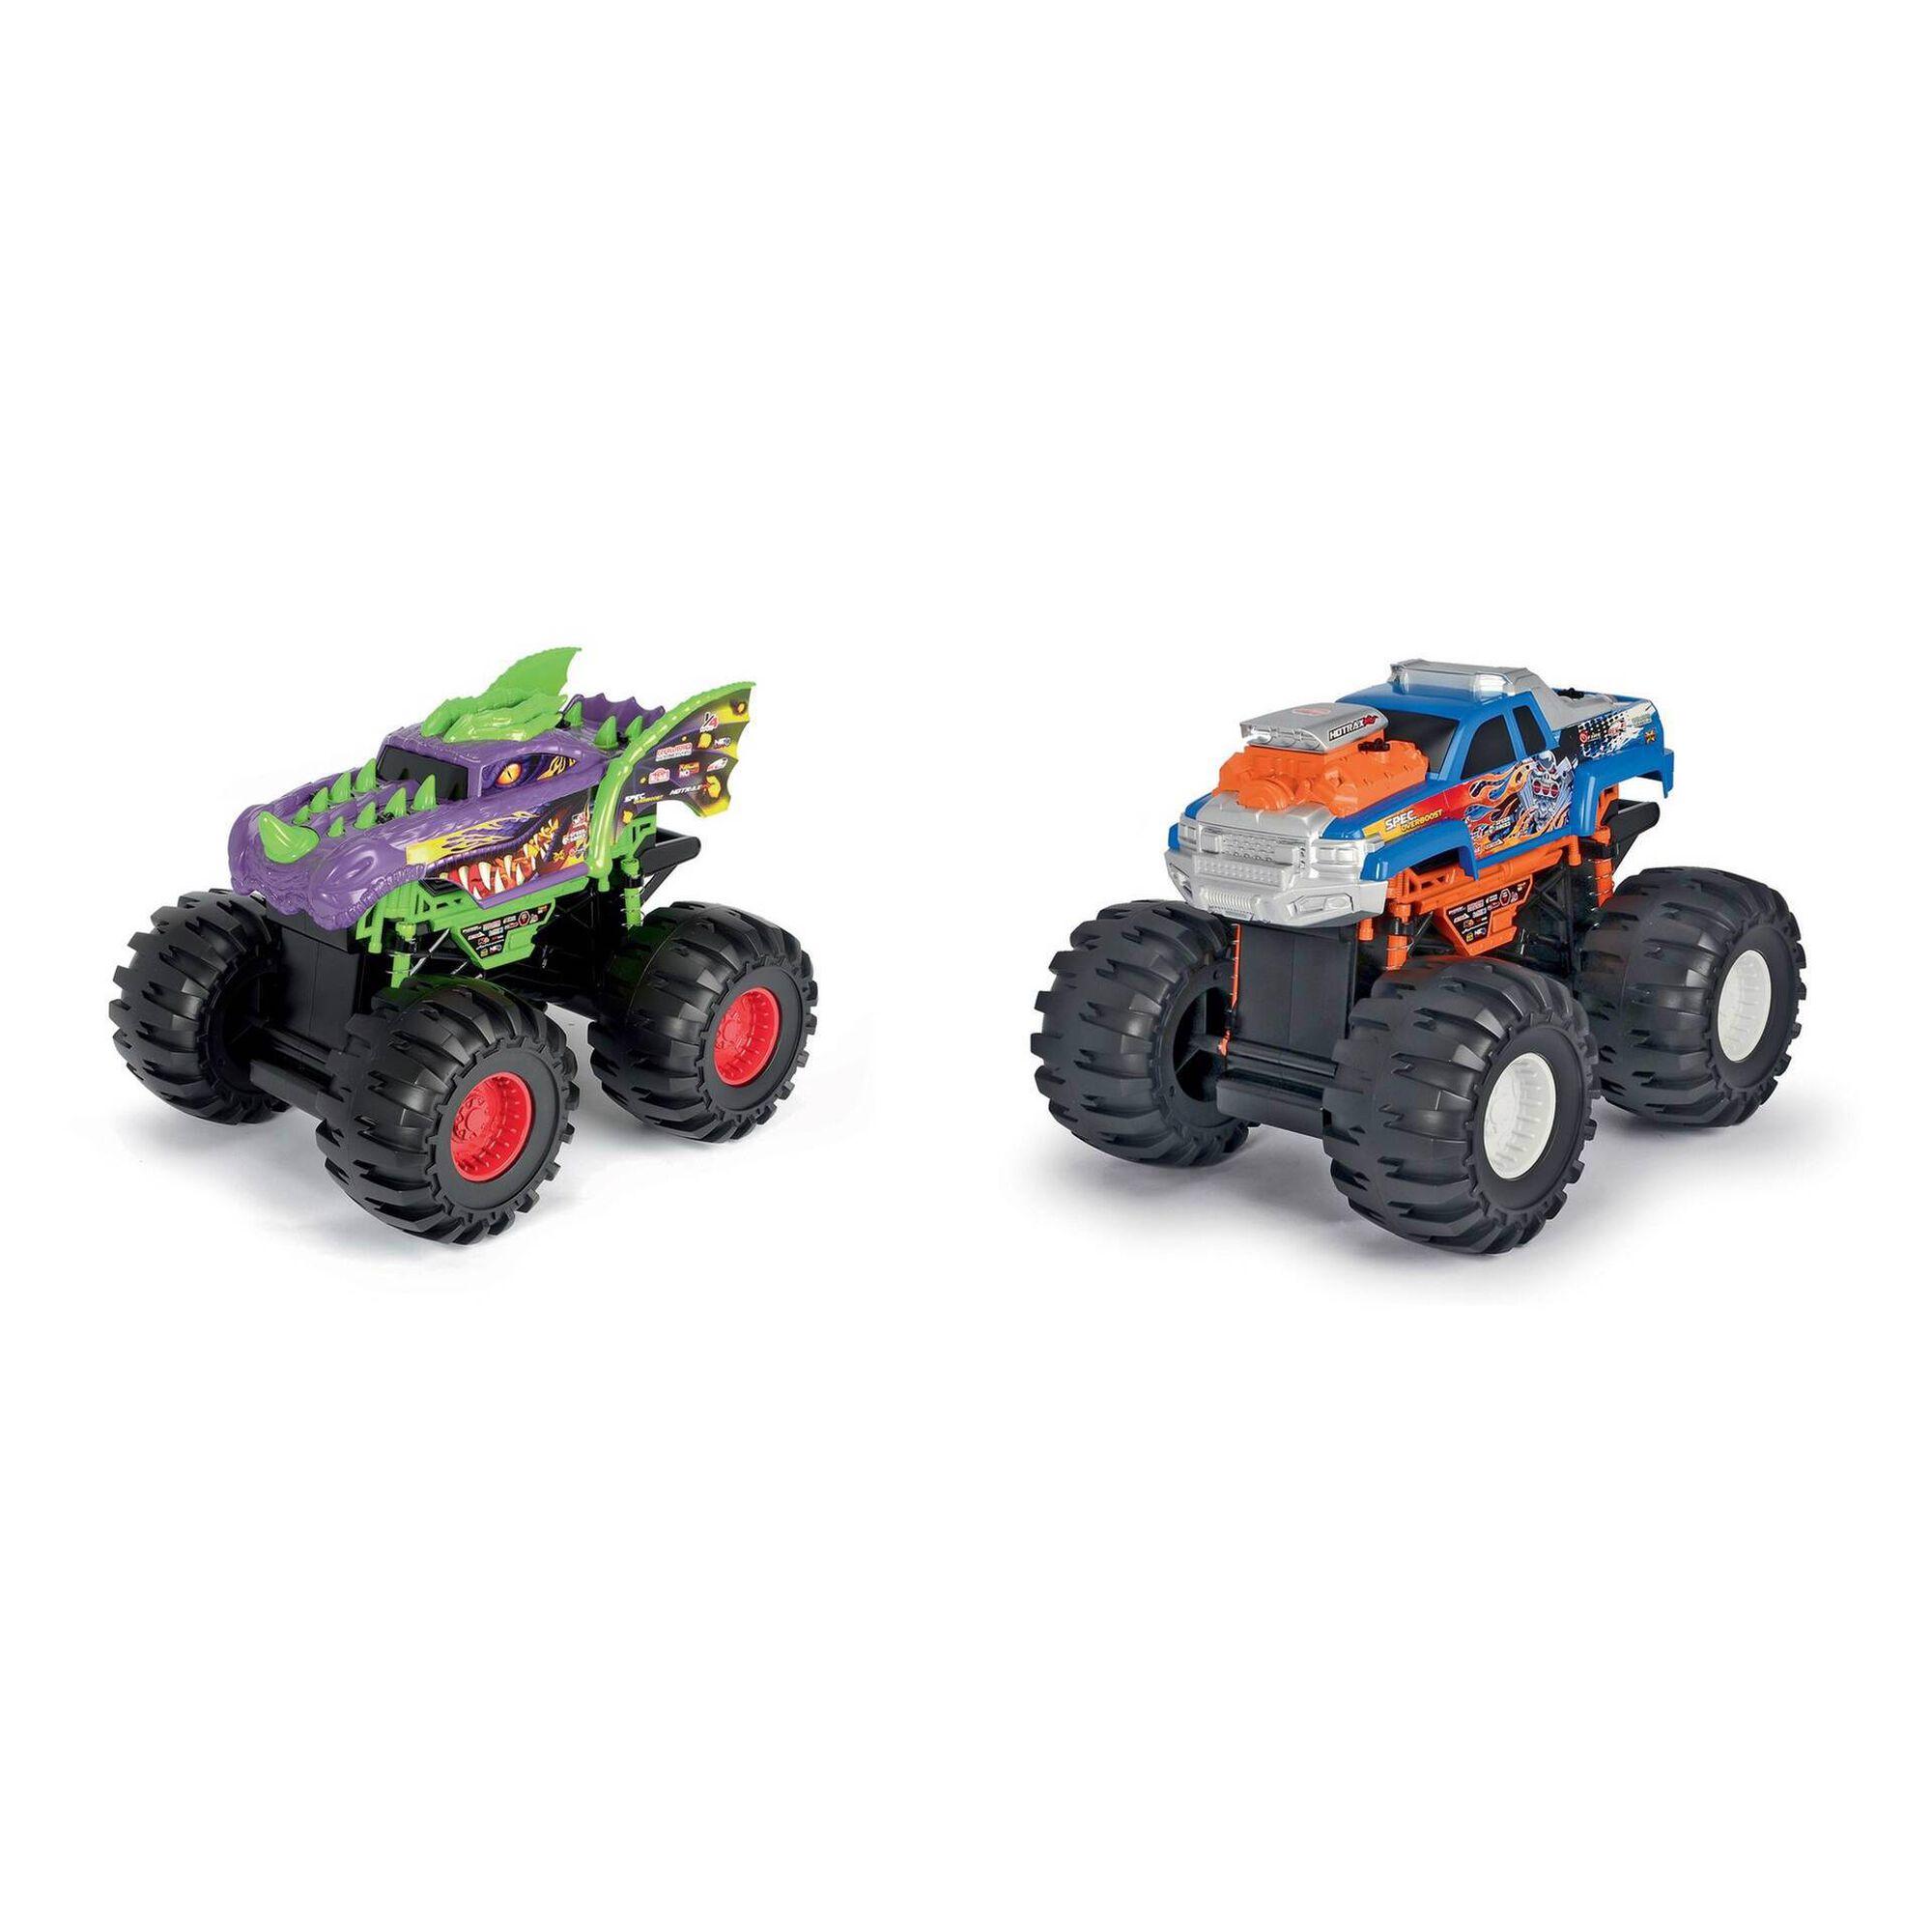 Veículo Monster Truck (vários modelos)